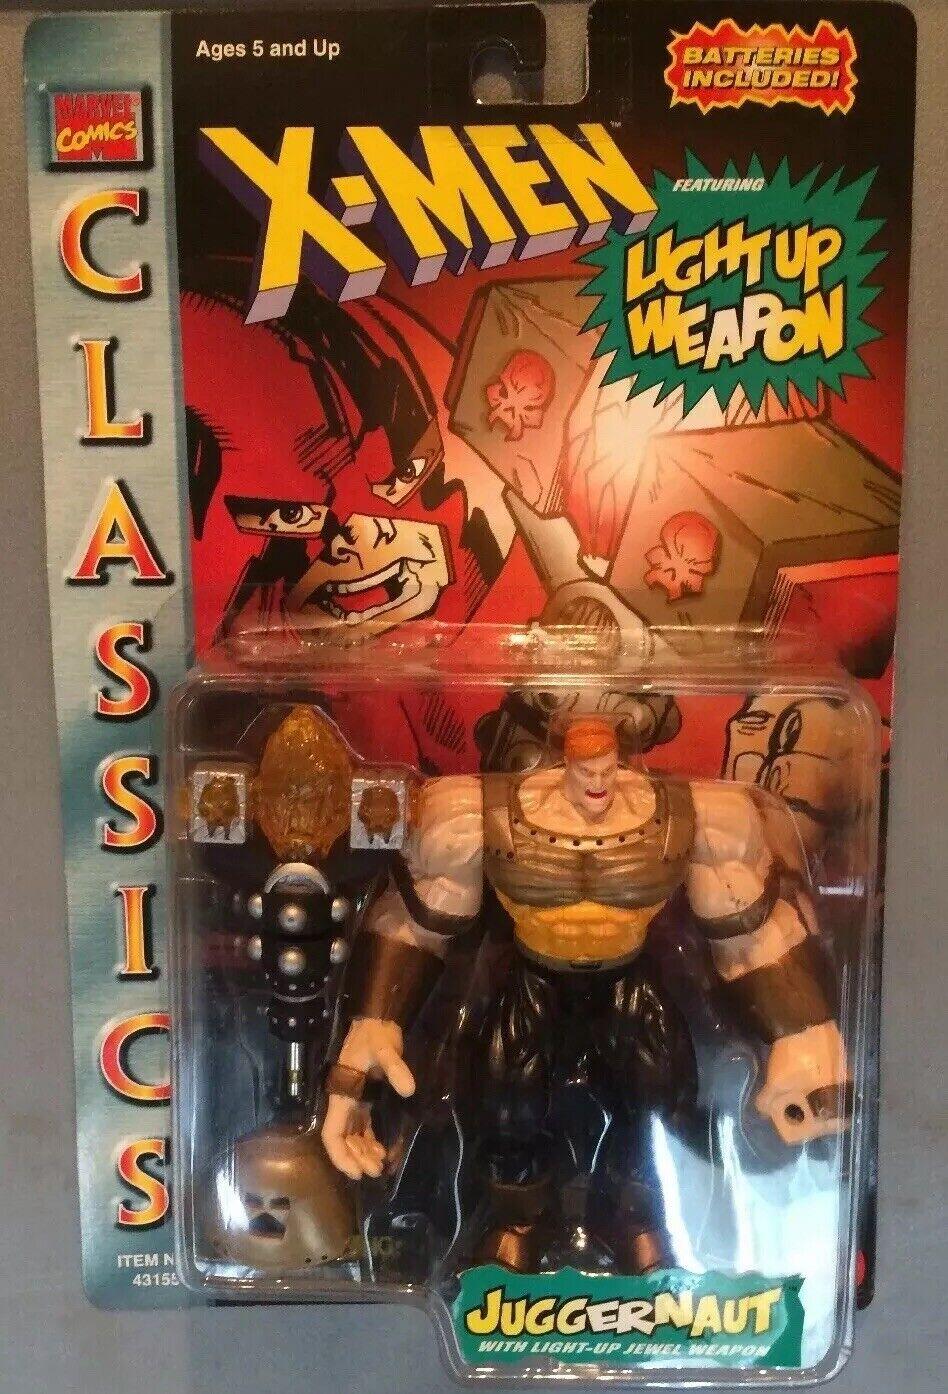 1996-Marvel classeics-RULLO COMPRESSORE cifra X-essi-Light Up ARMA ⭐ VINTAGE ⭐